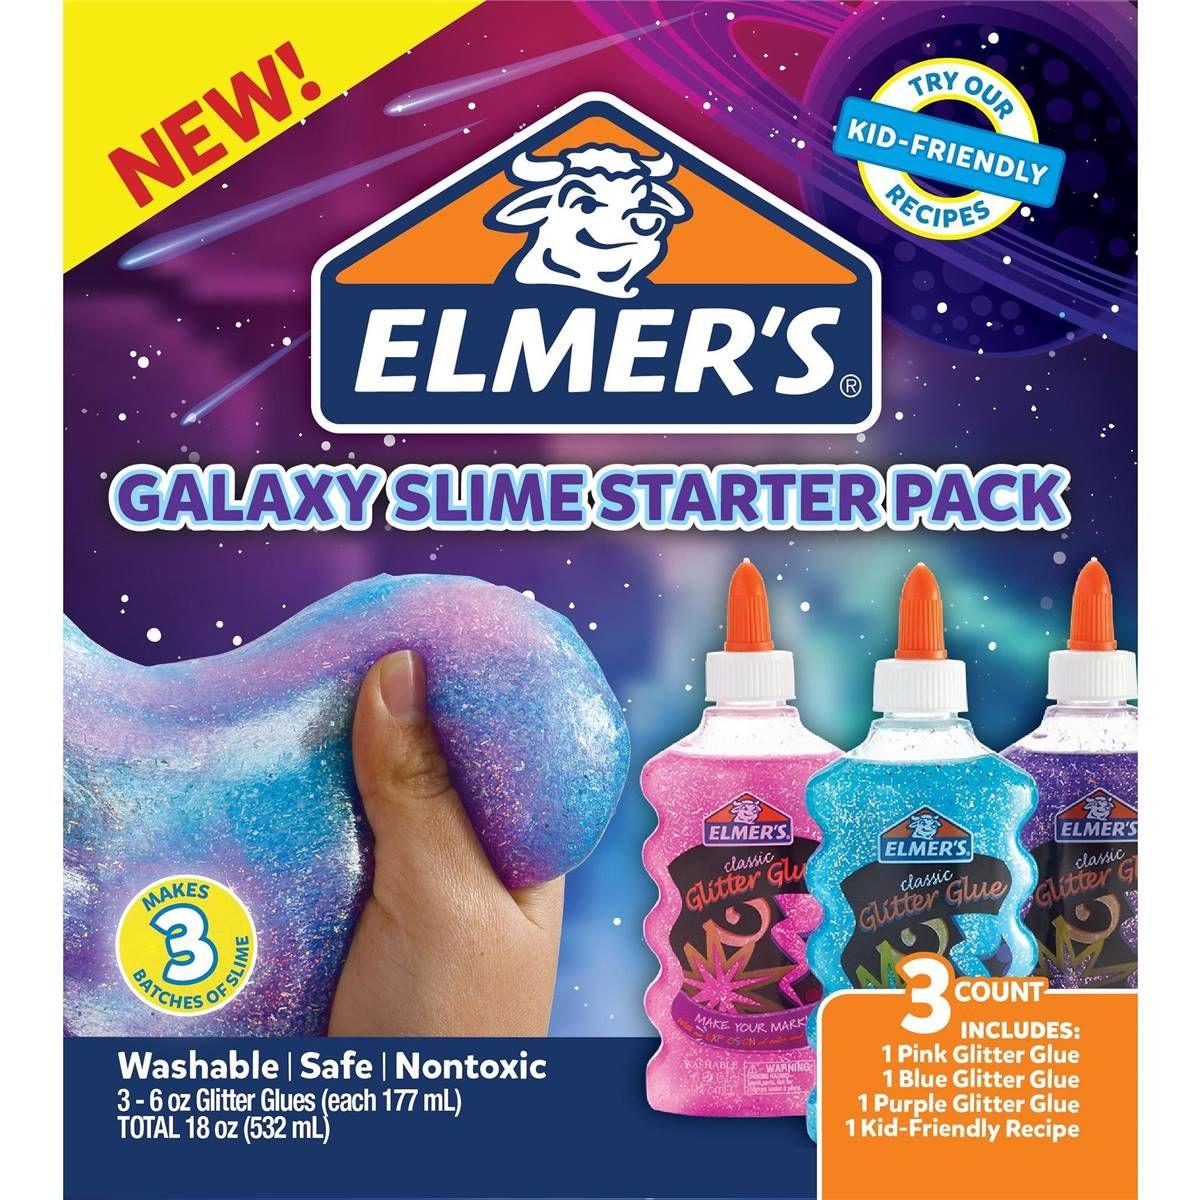 Elmers Galaxy Slime Starter Kit 3 Pack Woolworths Galaxy Slime